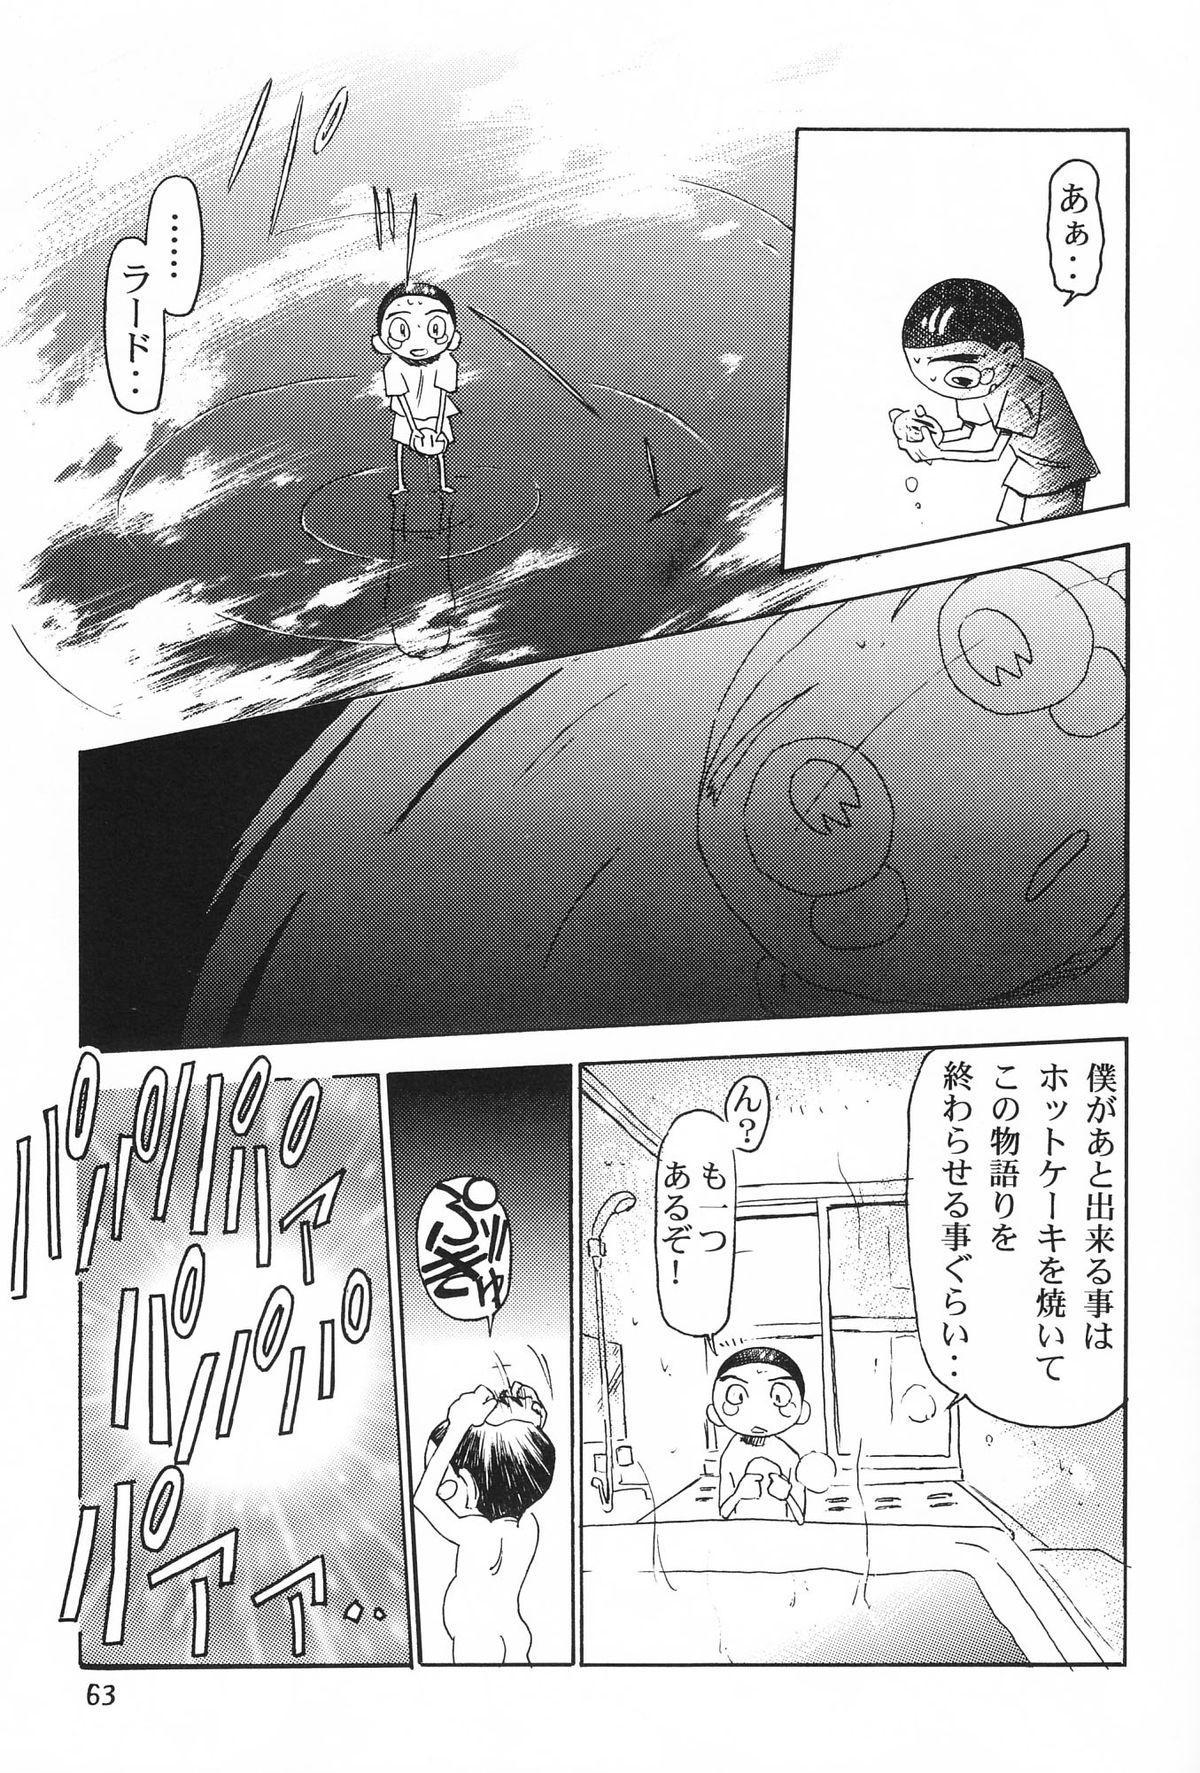 Henrei-kai '98 Natsu SPECIAL 62